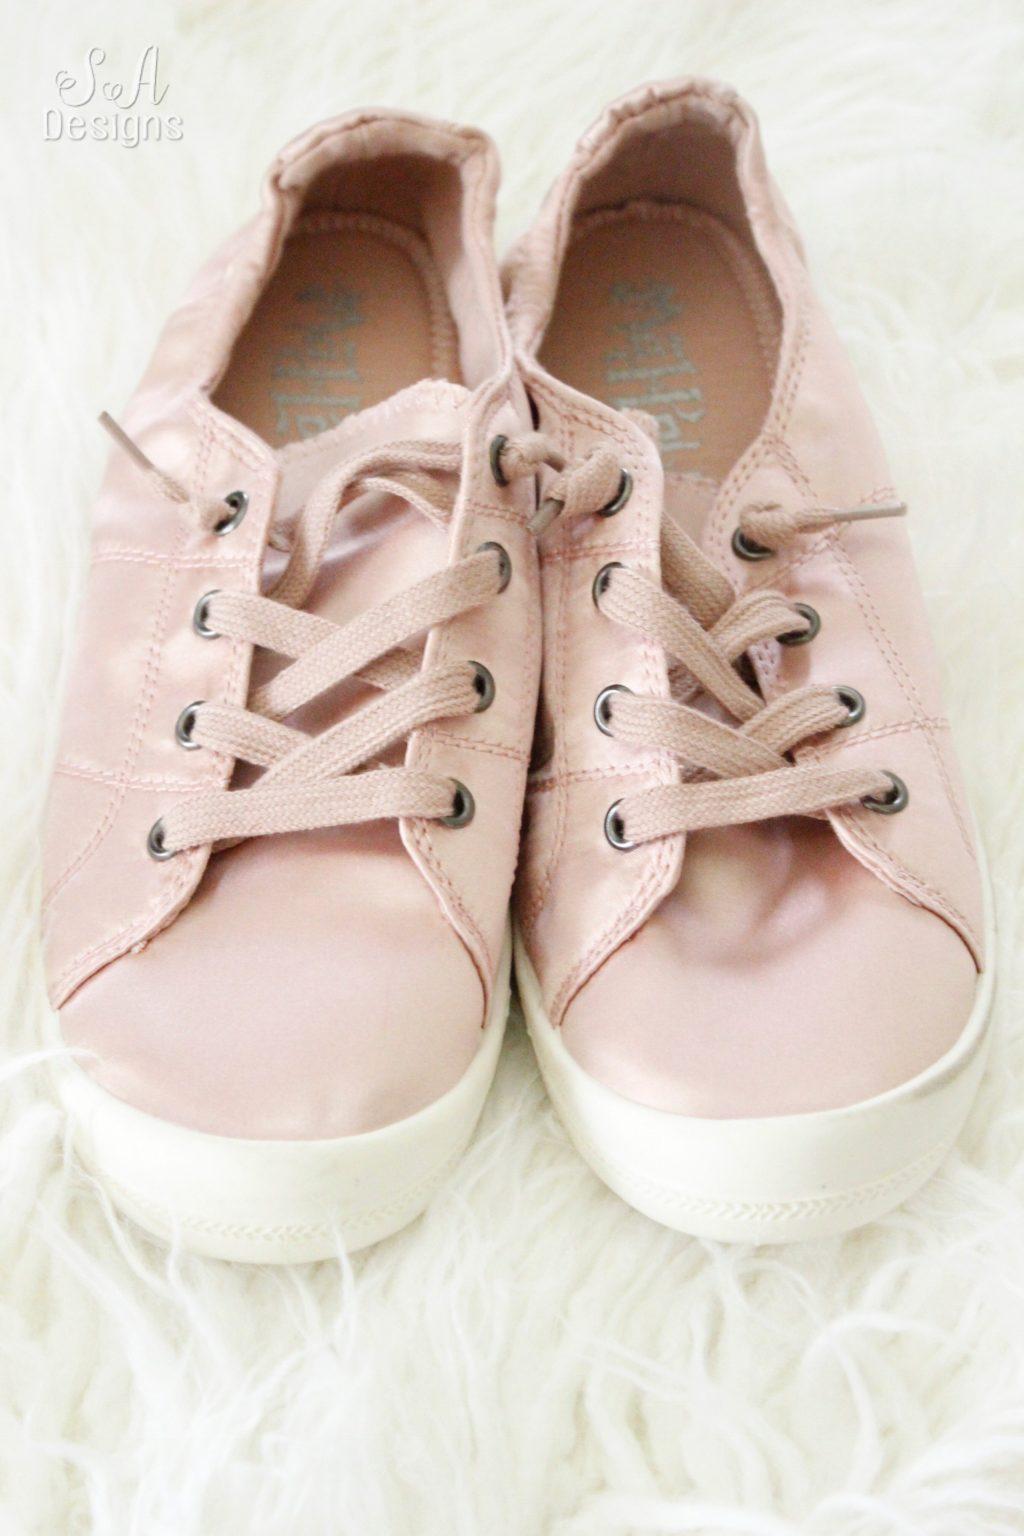 02a7e351104c A Few Fabulous Shoe Finds For The Fall   Winter - Summer Adams